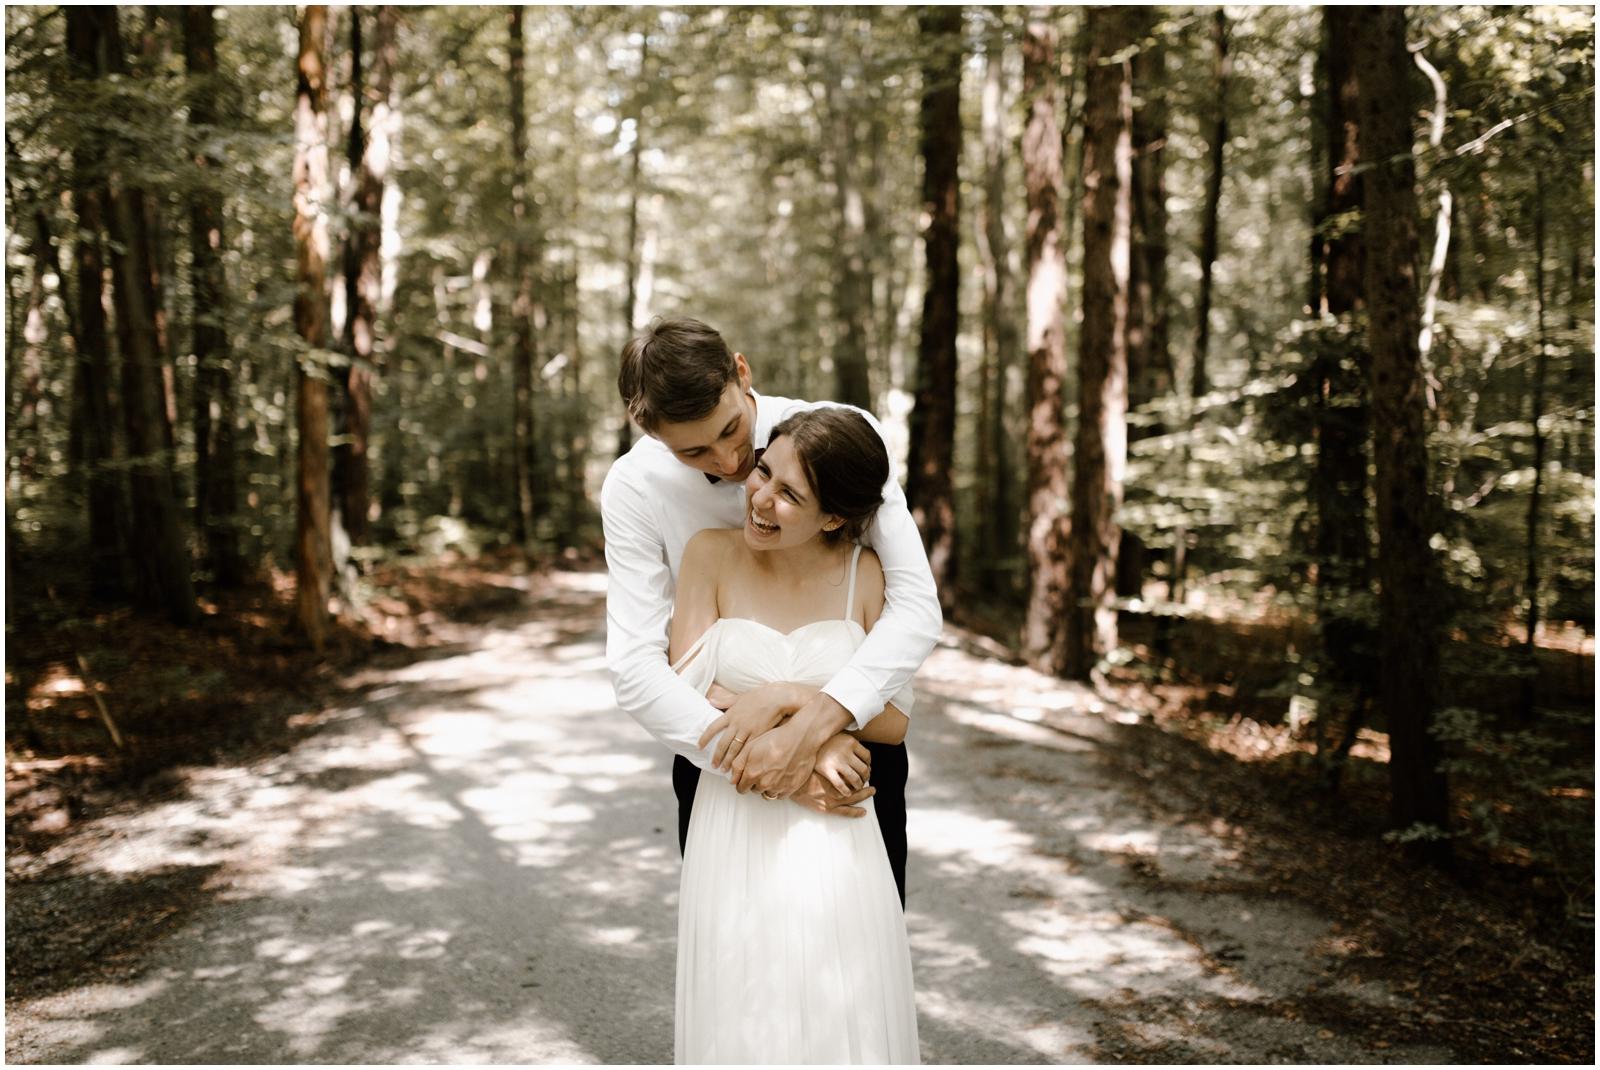 mirjam_thomas_wedding-234.jpg